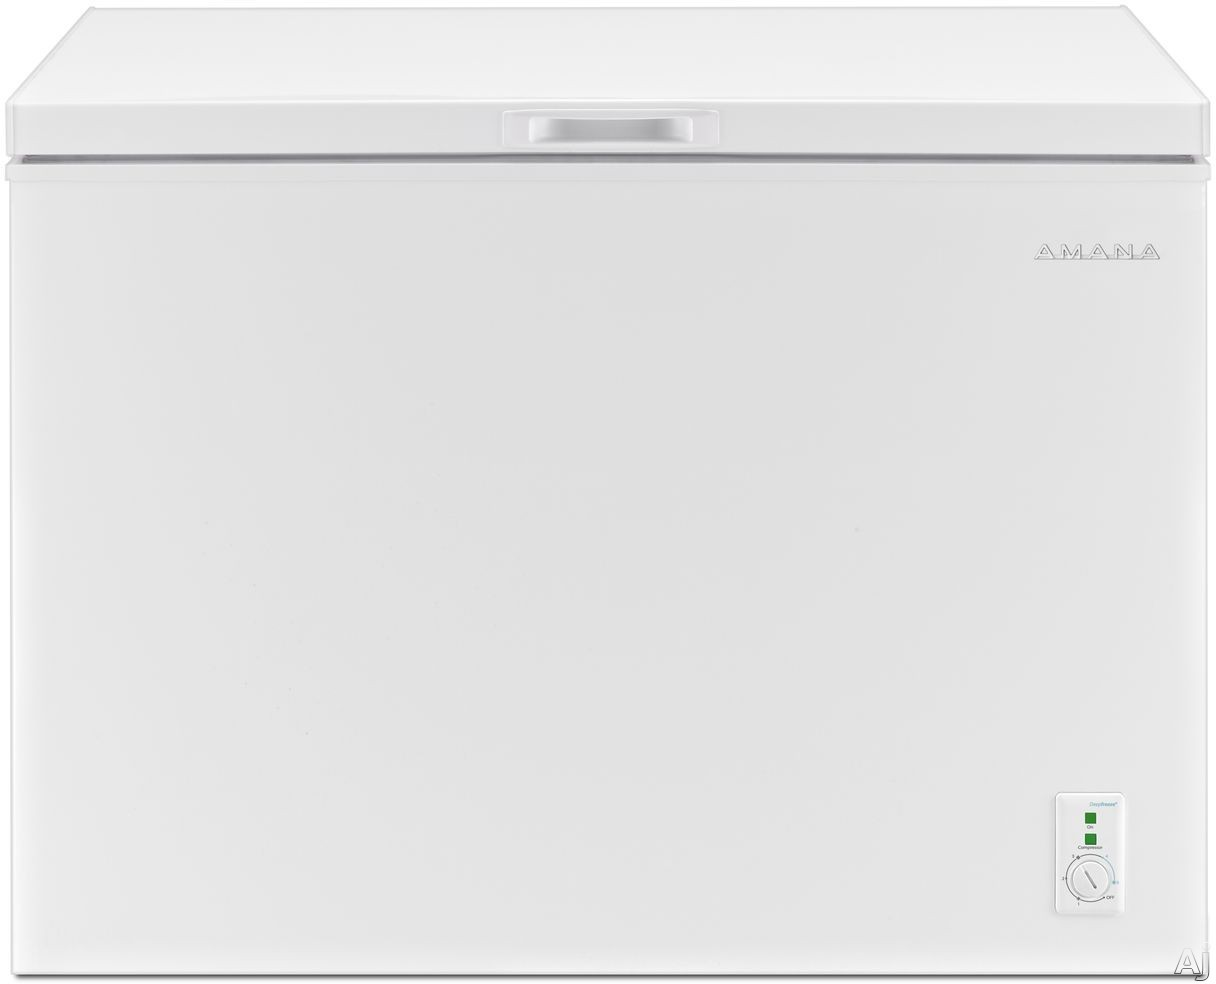 Amana AQC0902GRW 44 Inch Chest Freezer with DeepFreeze, Flexible Installation, 9 cu. ft. Capacity, 2 Baskets and Top Door Swing AQC0902GRW